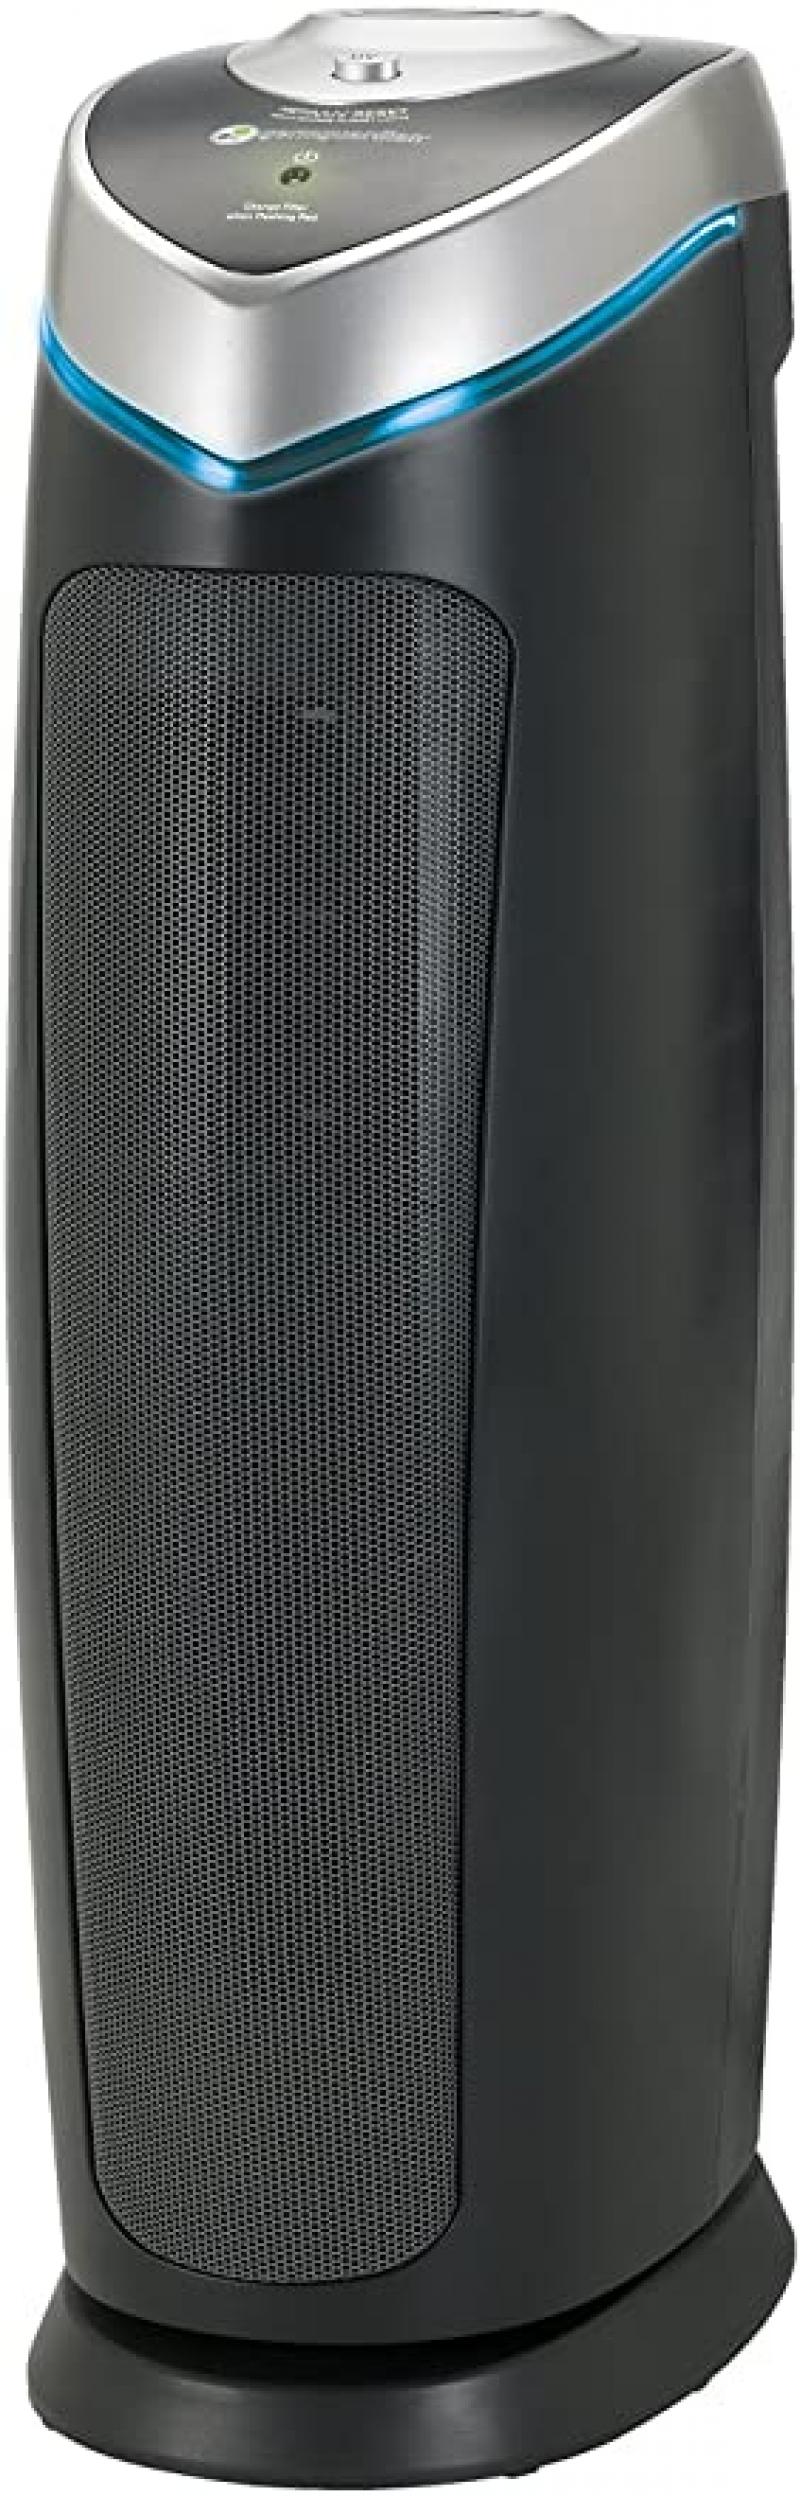 ihocon: Germ Guardian True HEPA Filter Air Purifier with UV Light Sanitizer 紫外線殺菌空氣淨化器/空氣清淨機